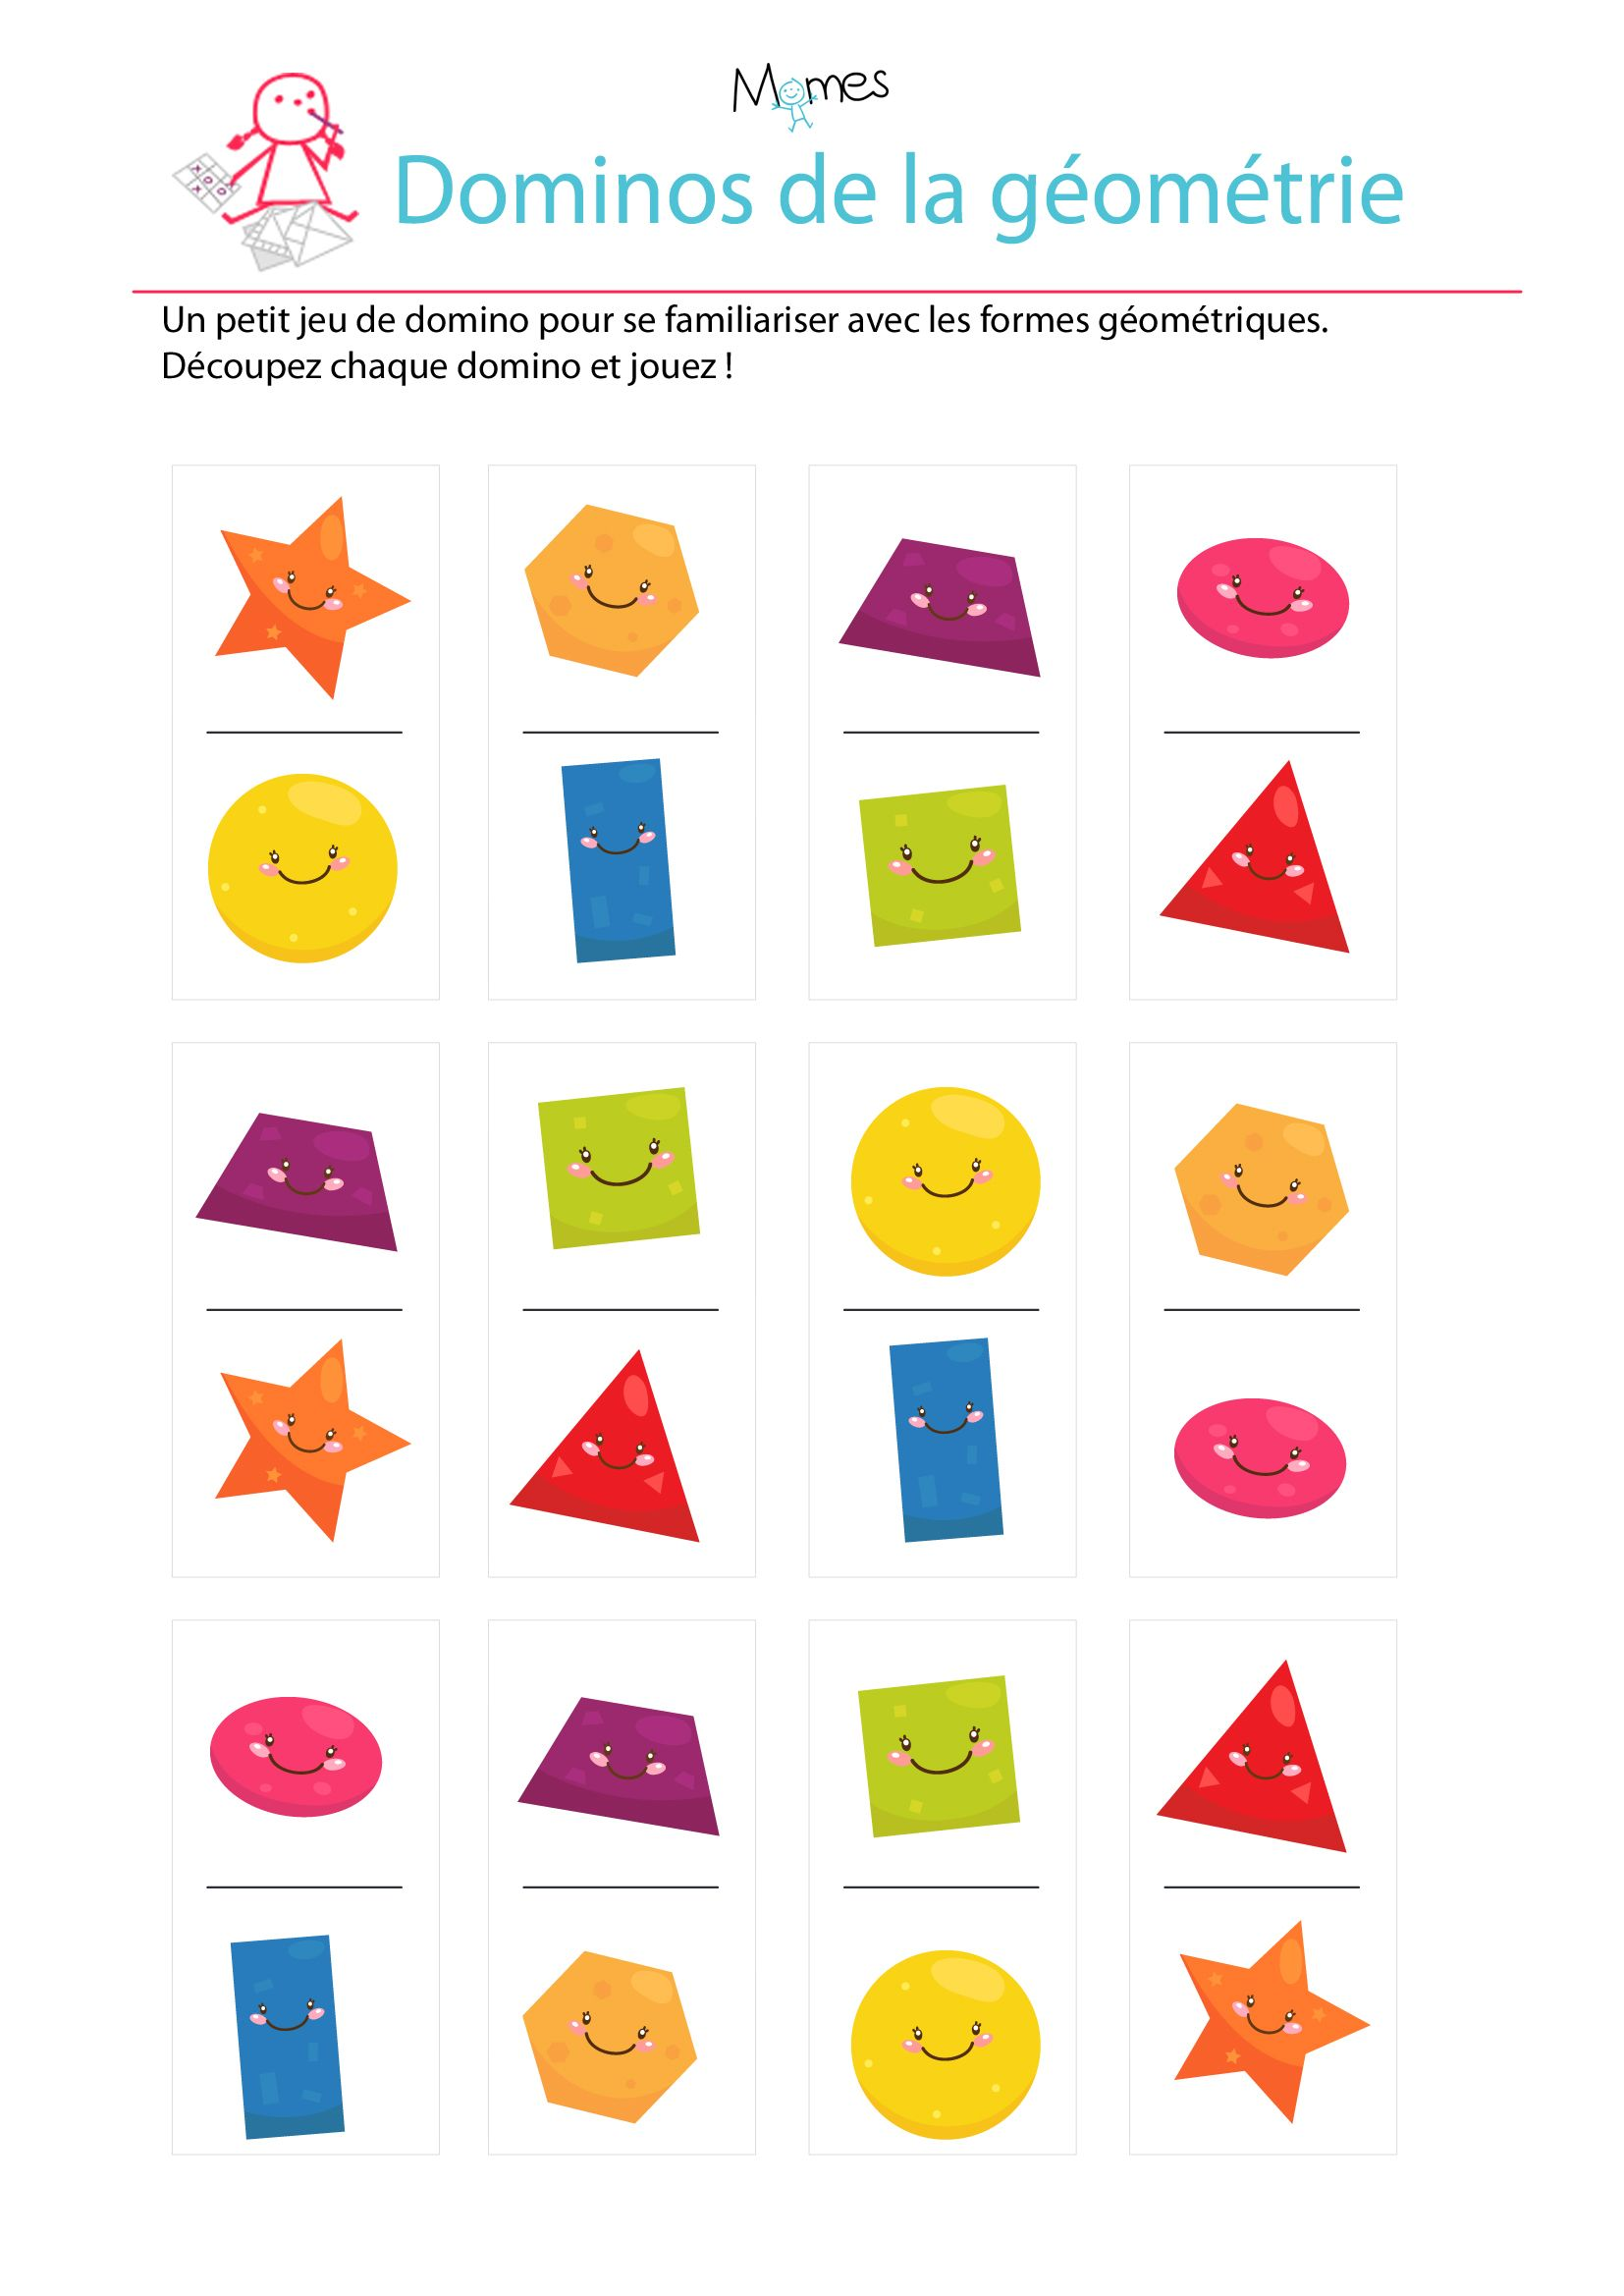 jeu de domino imprimer sur les formes g om triques id e timeo pinterest g om trie les. Black Bedroom Furniture Sets. Home Design Ideas